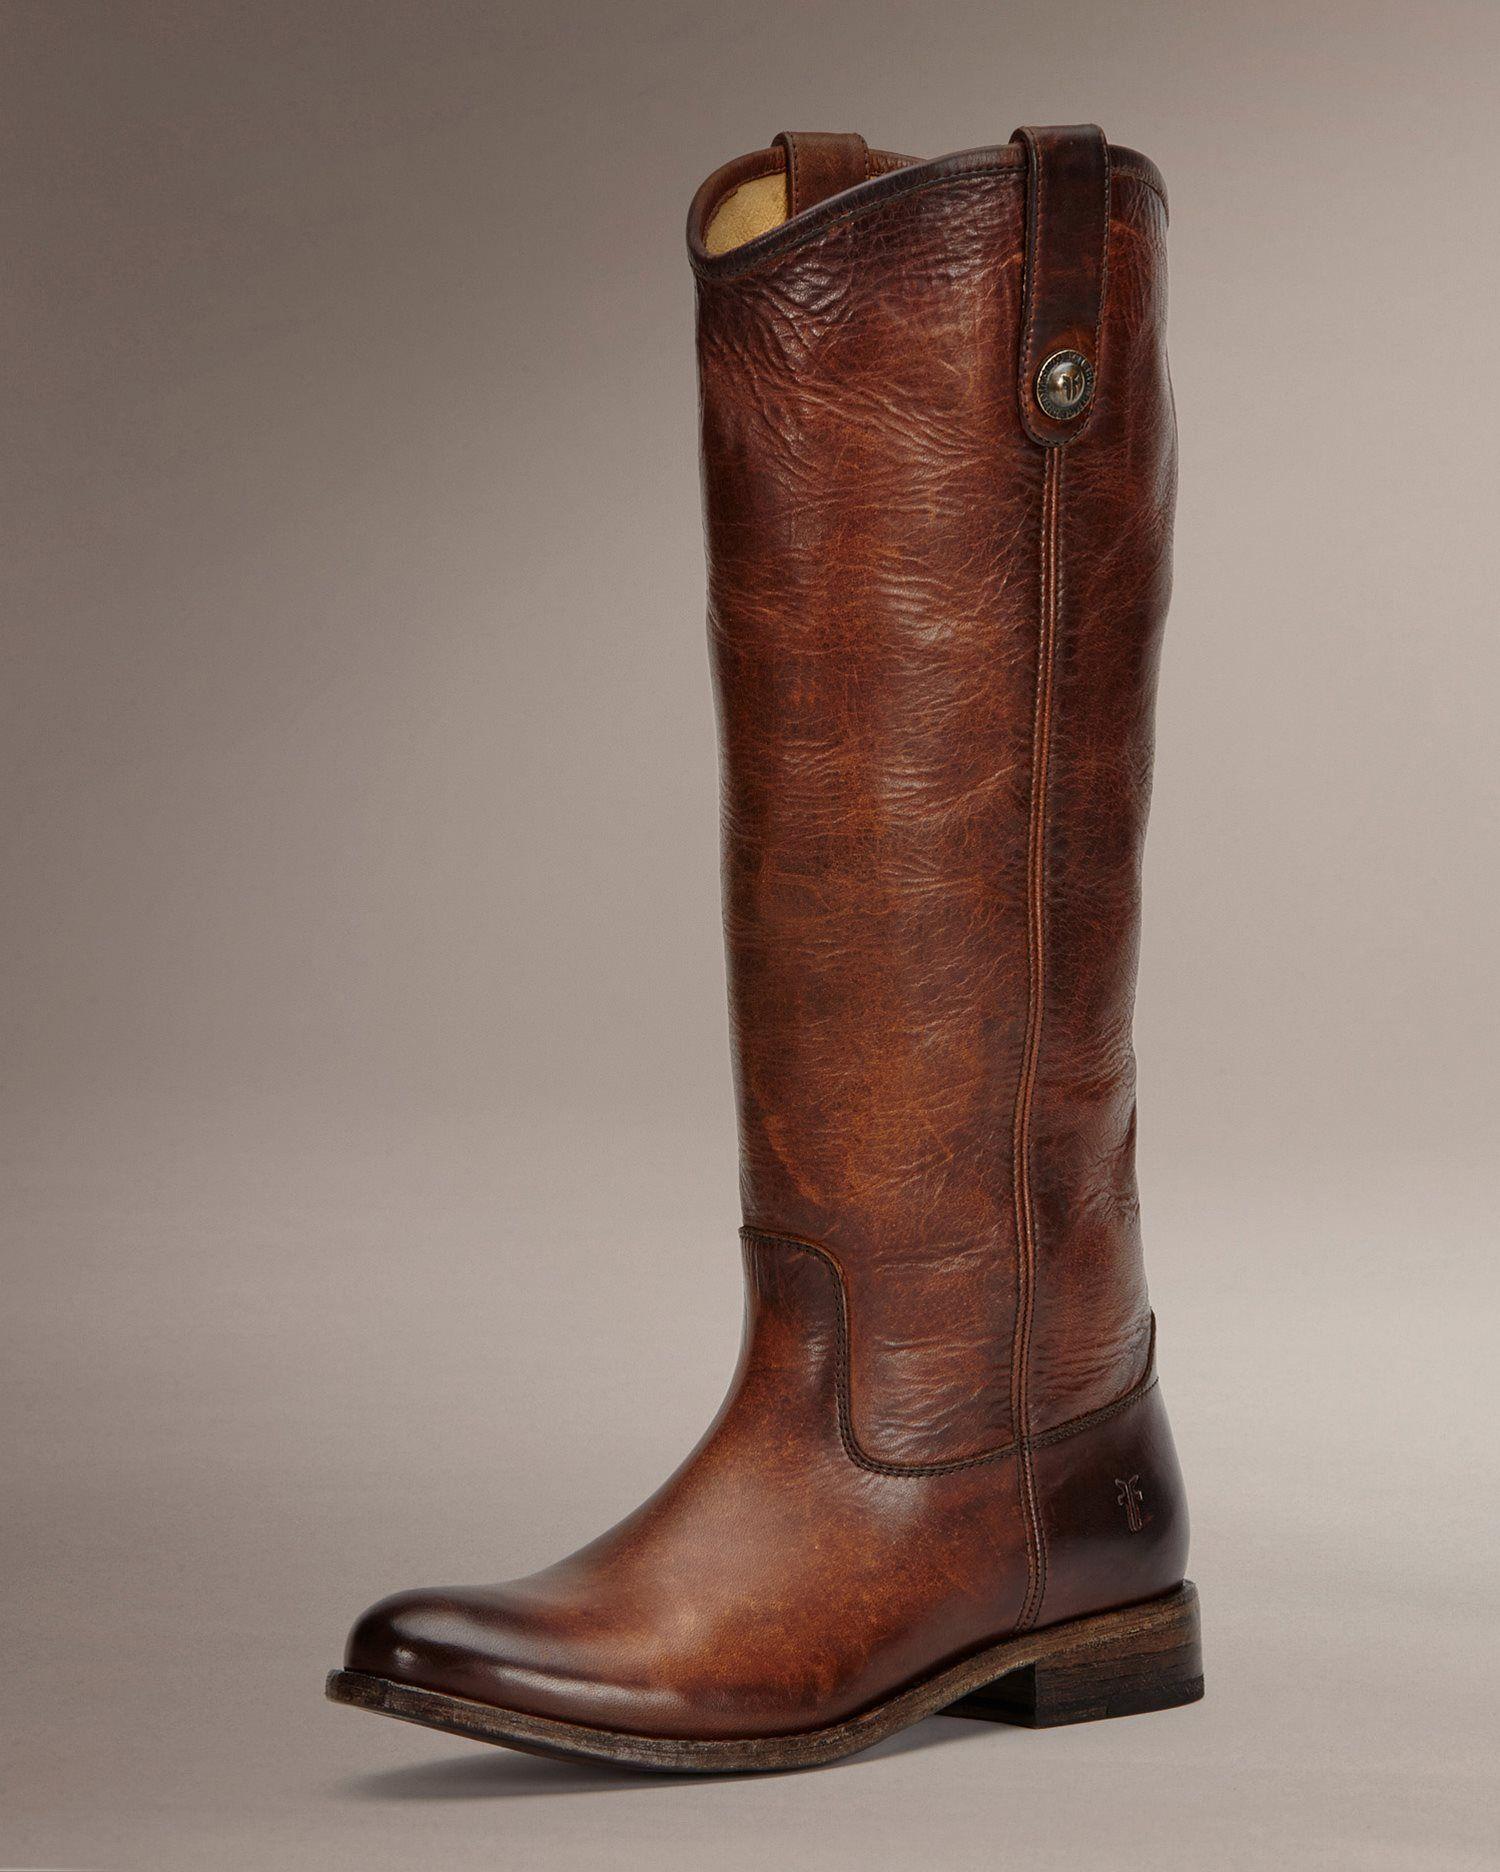 Shop FRYE New Arrivals | Women's Leather Boots | Since 1863